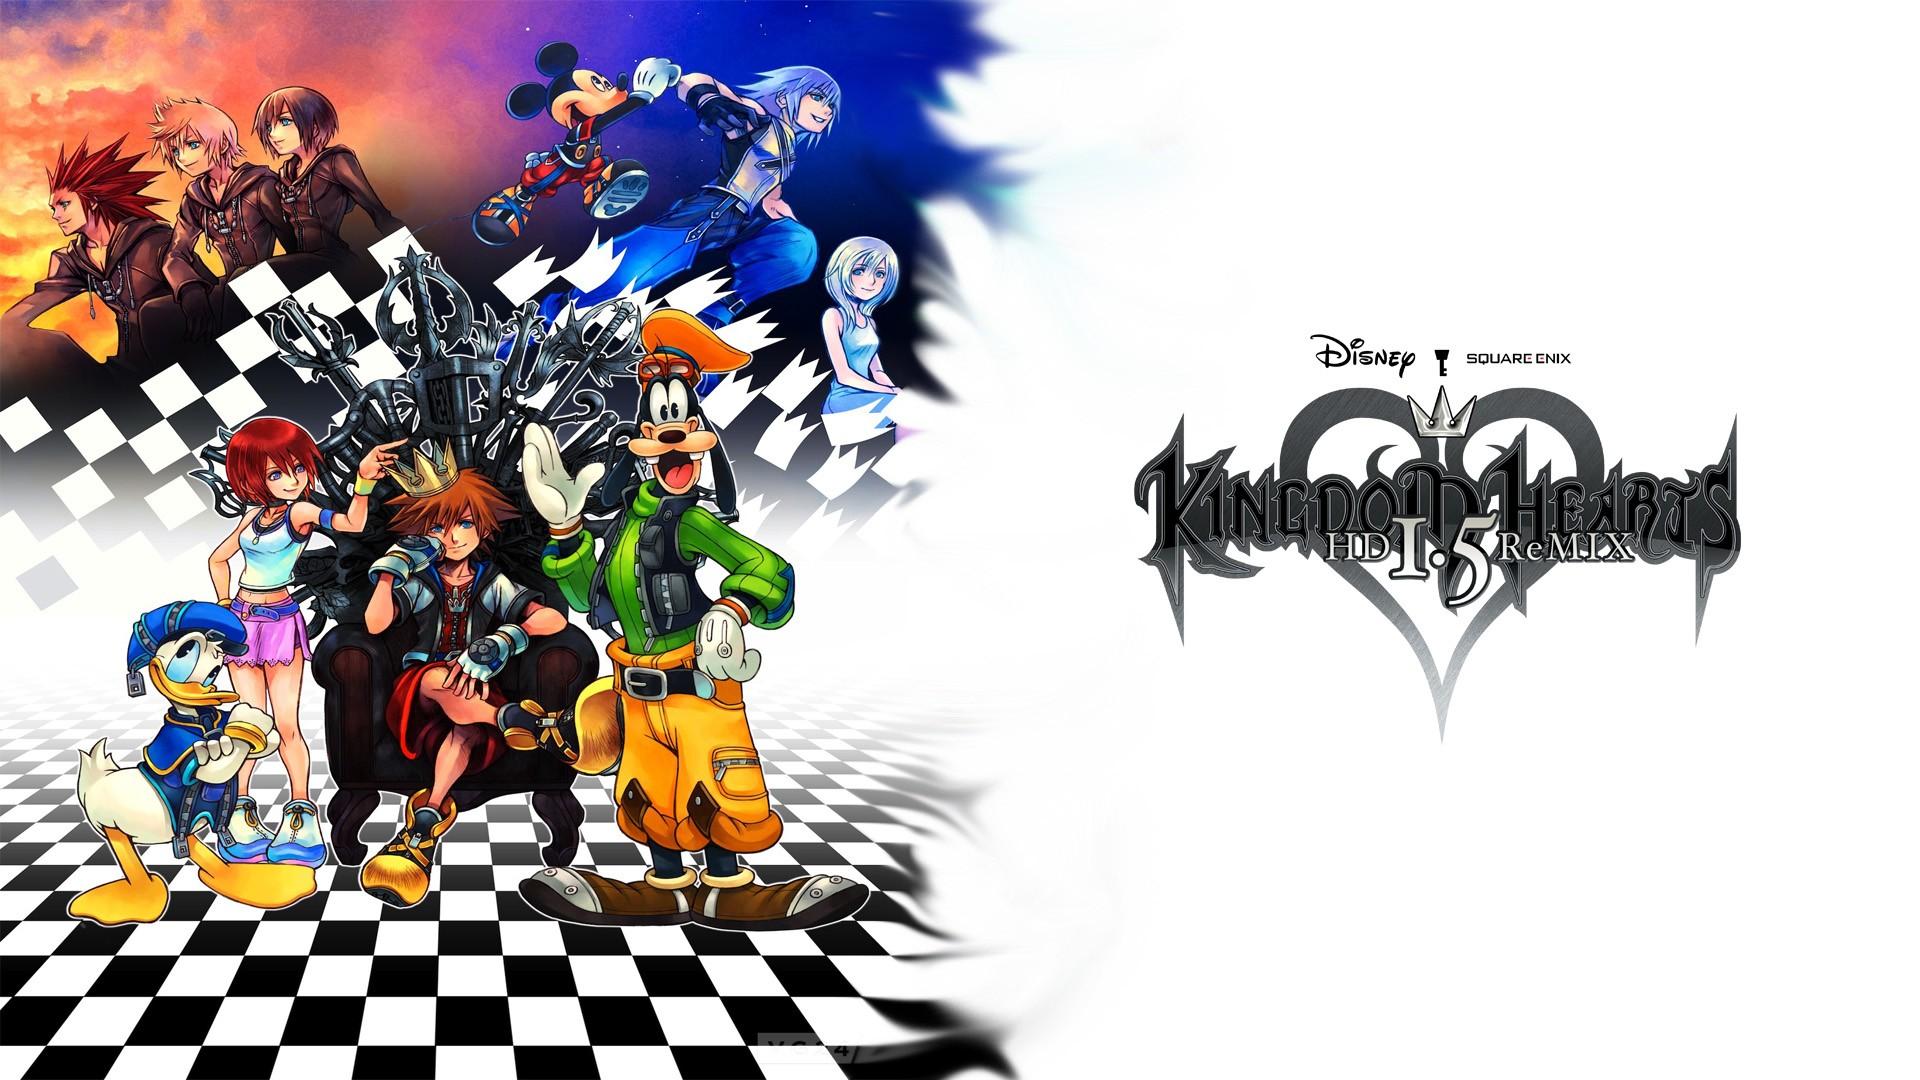 Hd Kingdom Hearts Wallpapers Group - Kingdom Hearts Wallpaper 1080p - HD Wallpaper